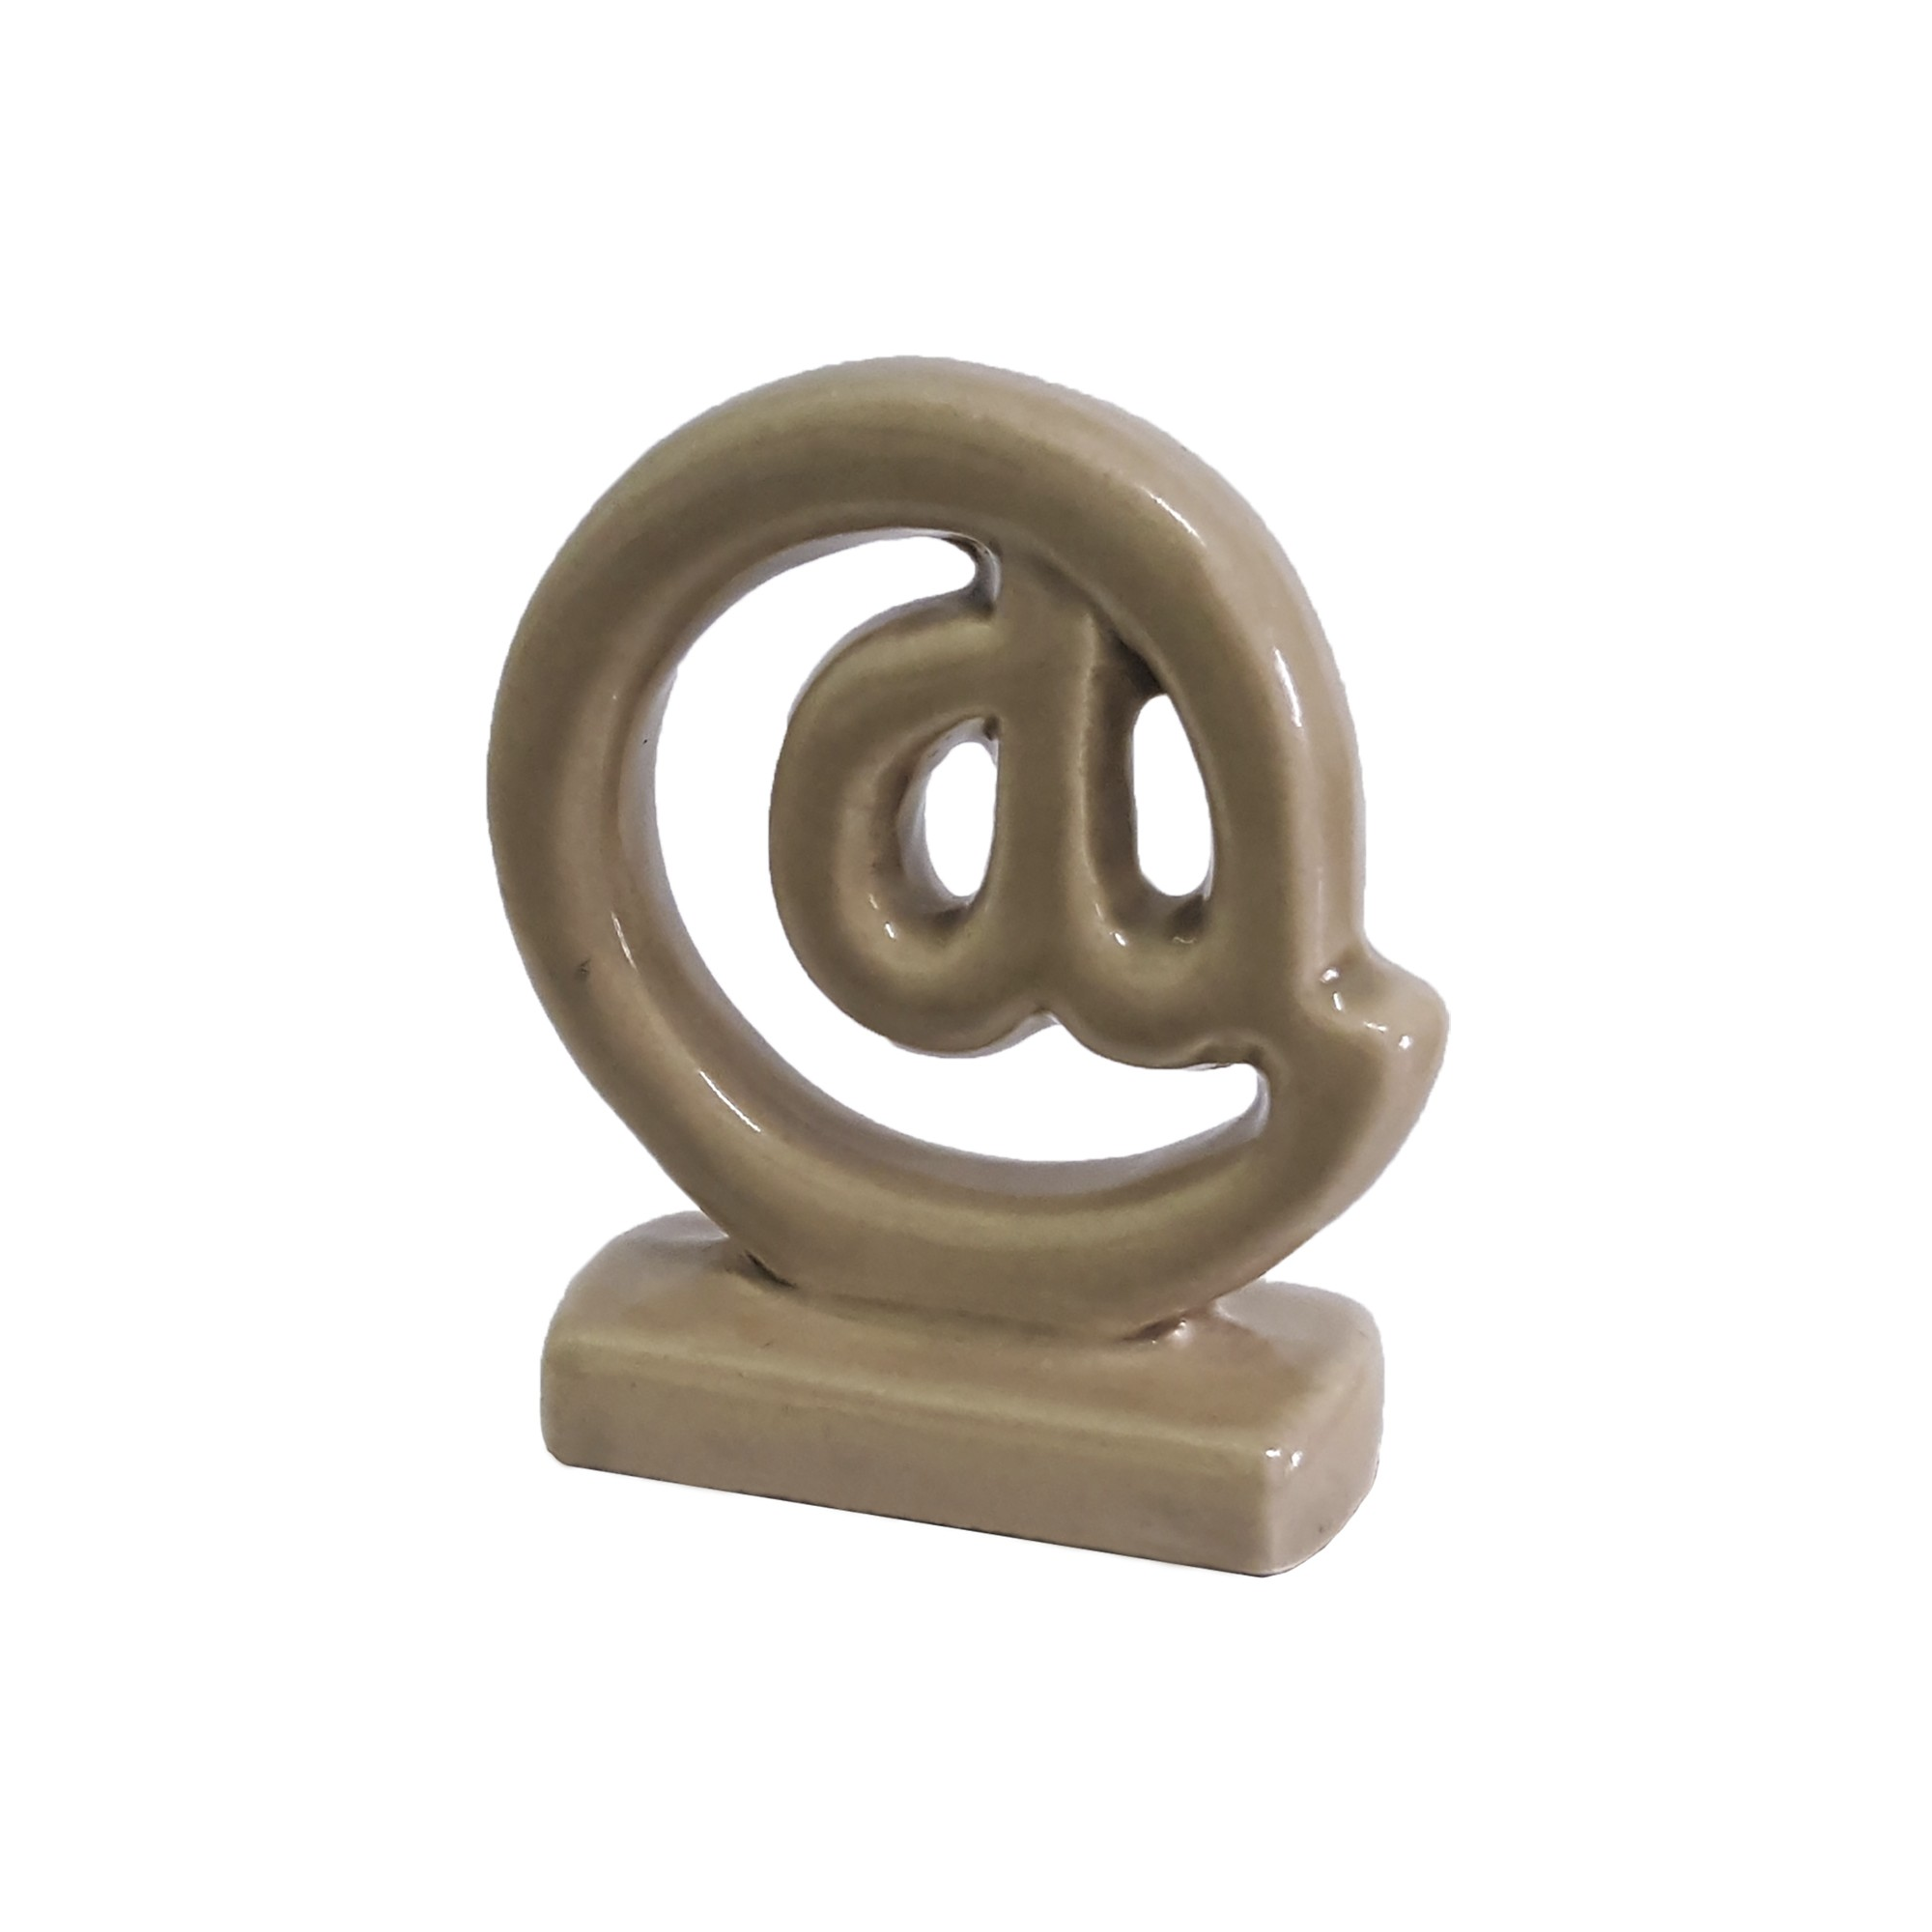 Enfeite Decorativo Arroba de Ceramica Fendi Brilho - Buzzio s